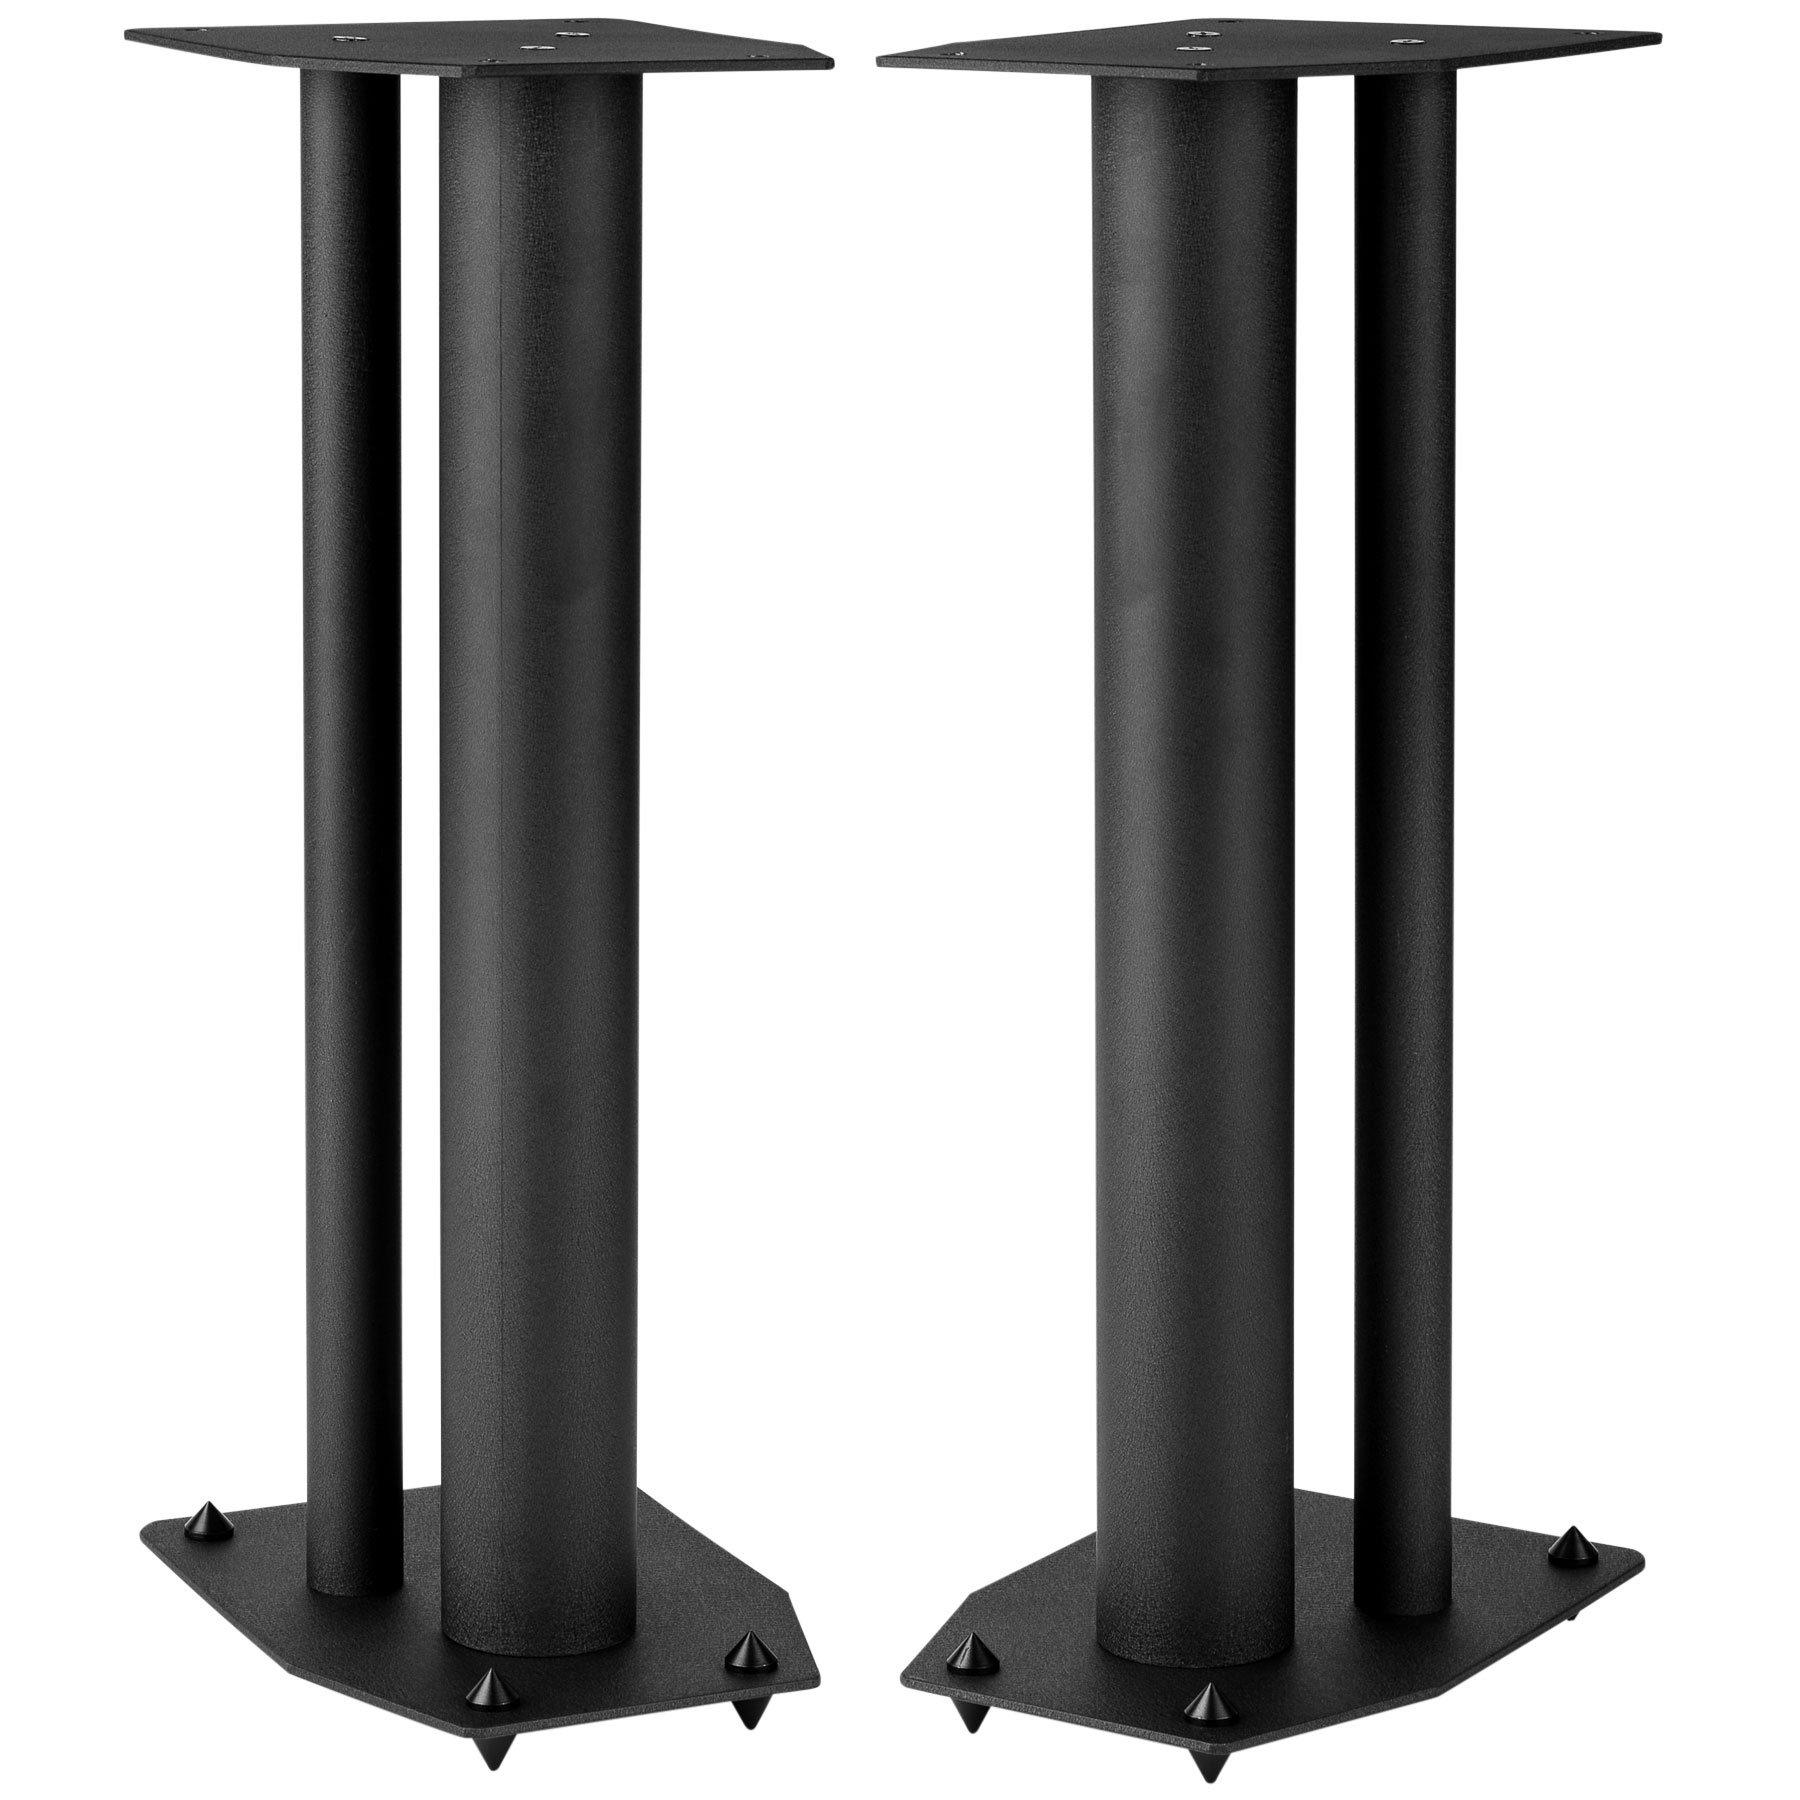 Dayton Audio SSMB24 24'' Speaker Stand Pair Square Steel Base by Dayton Audio